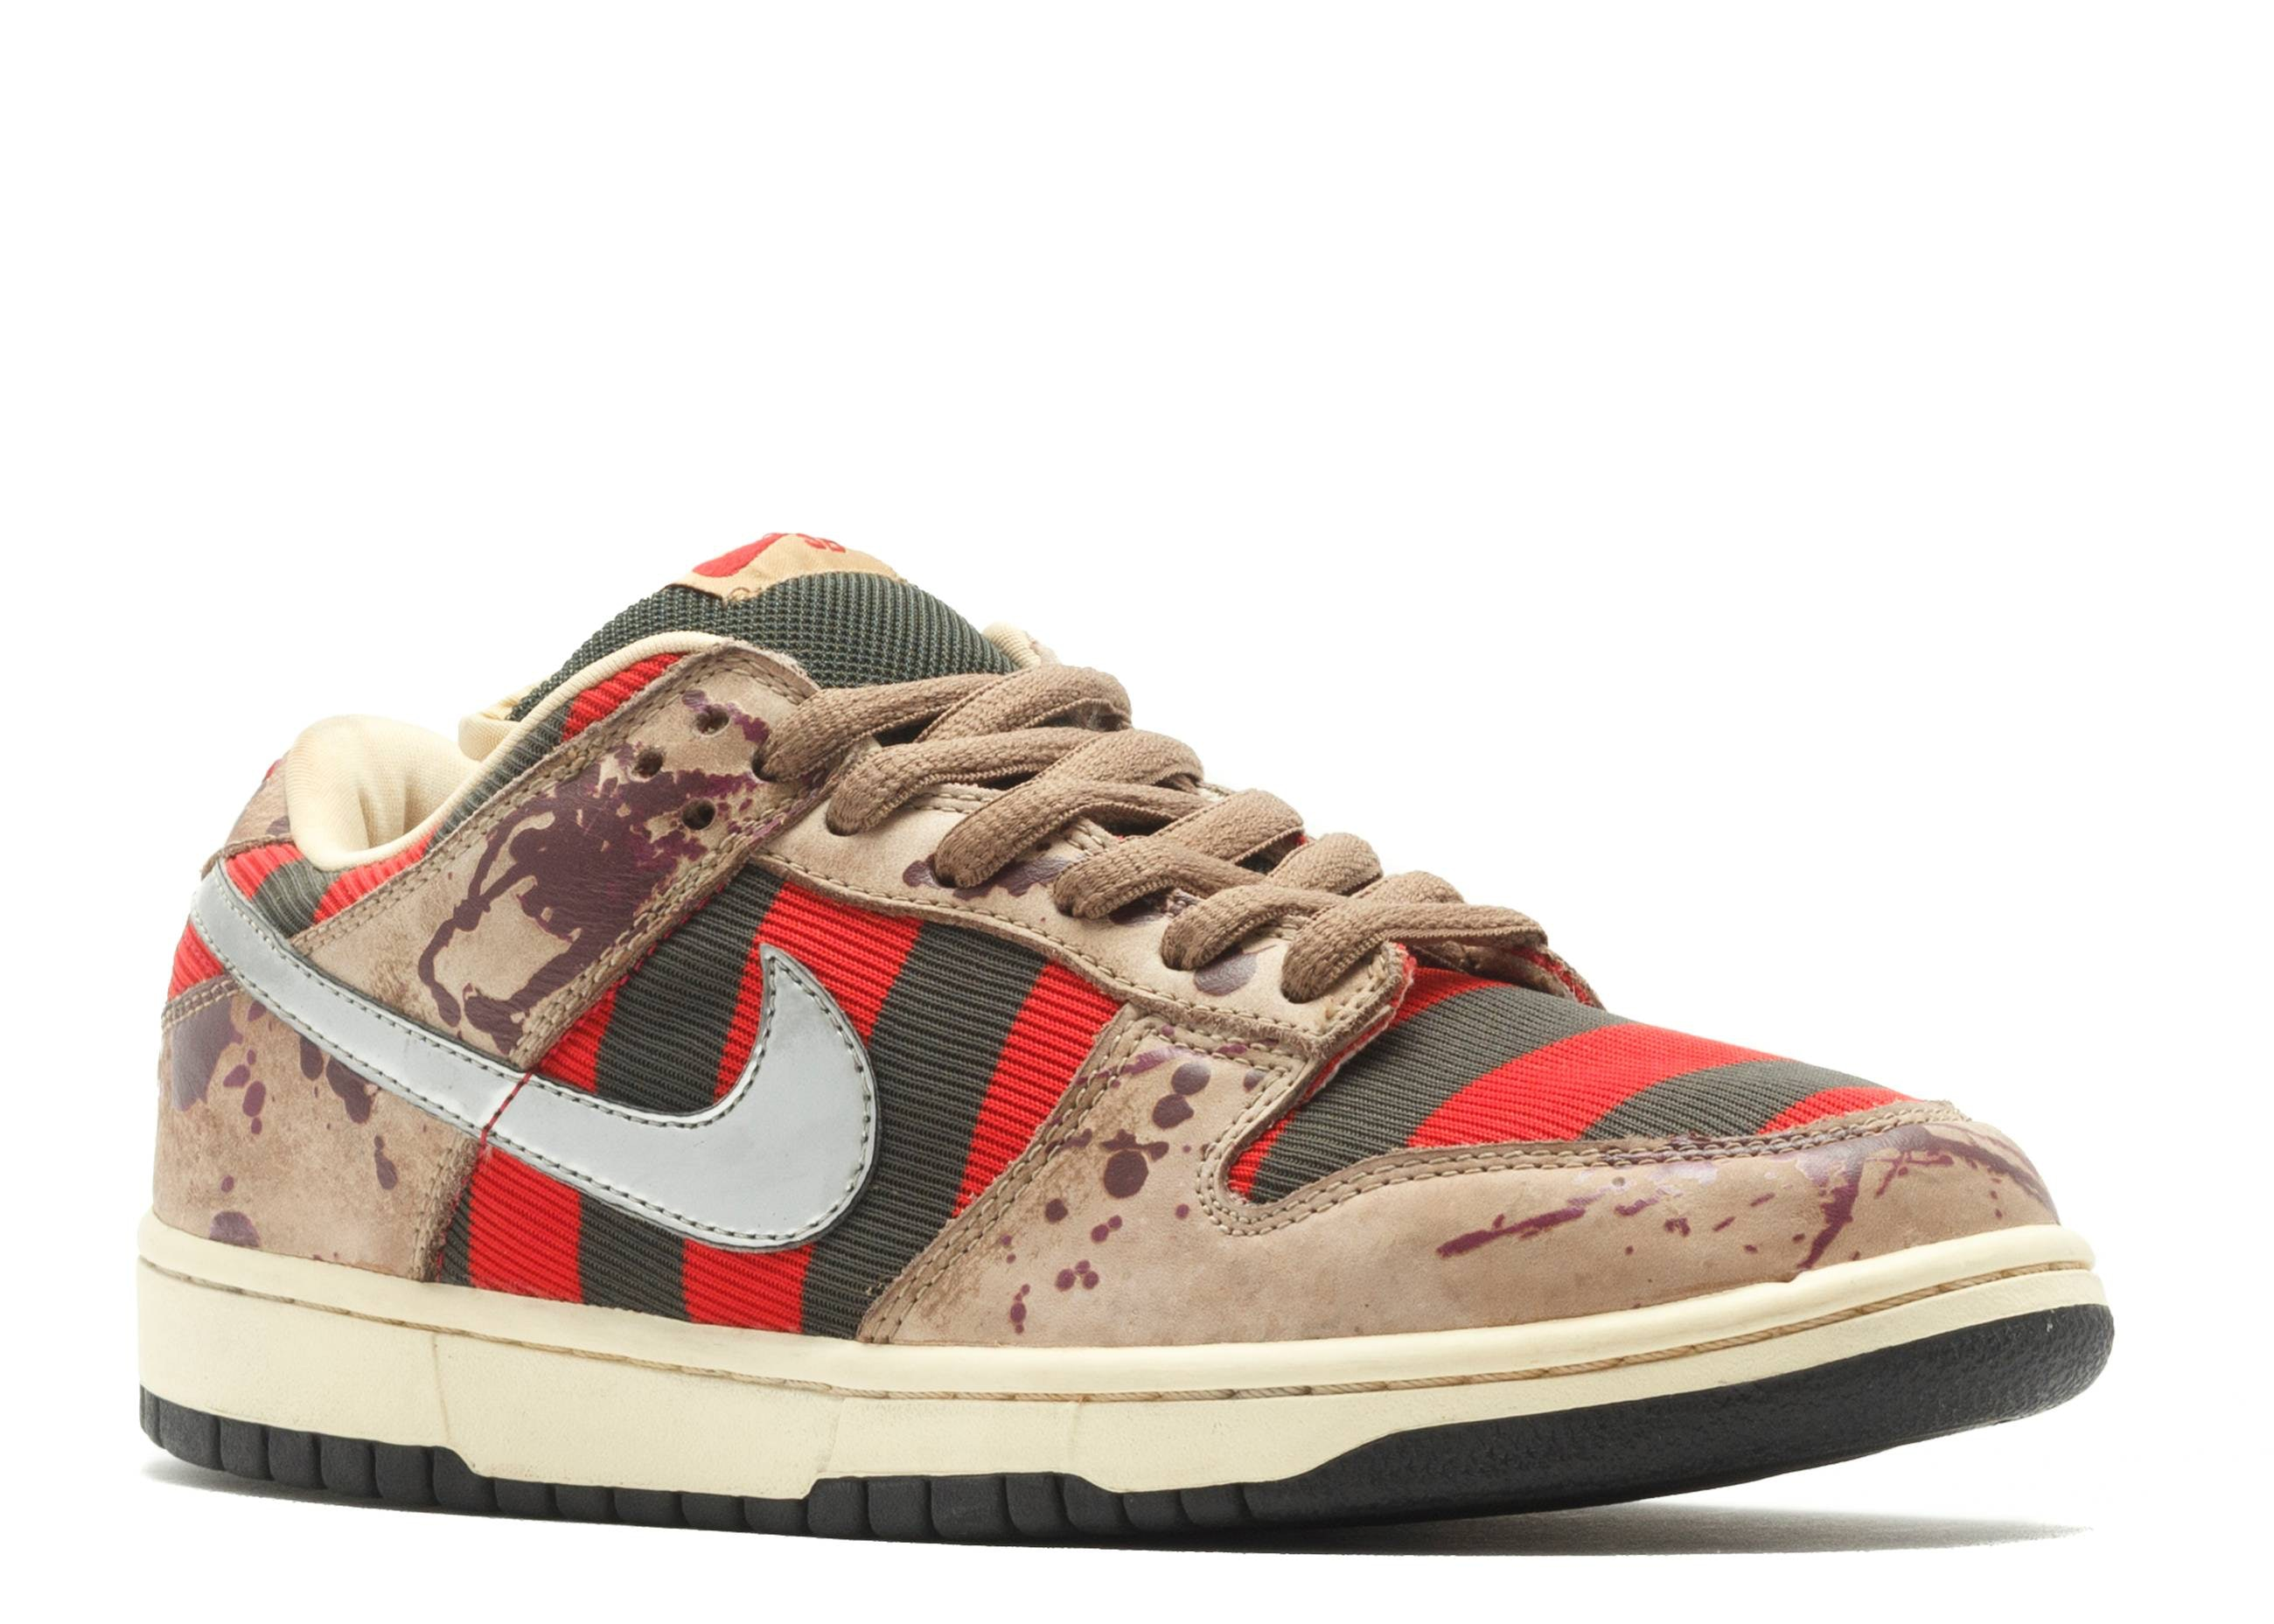 Nike's 'Freddy Krueger' SB Dunk is the